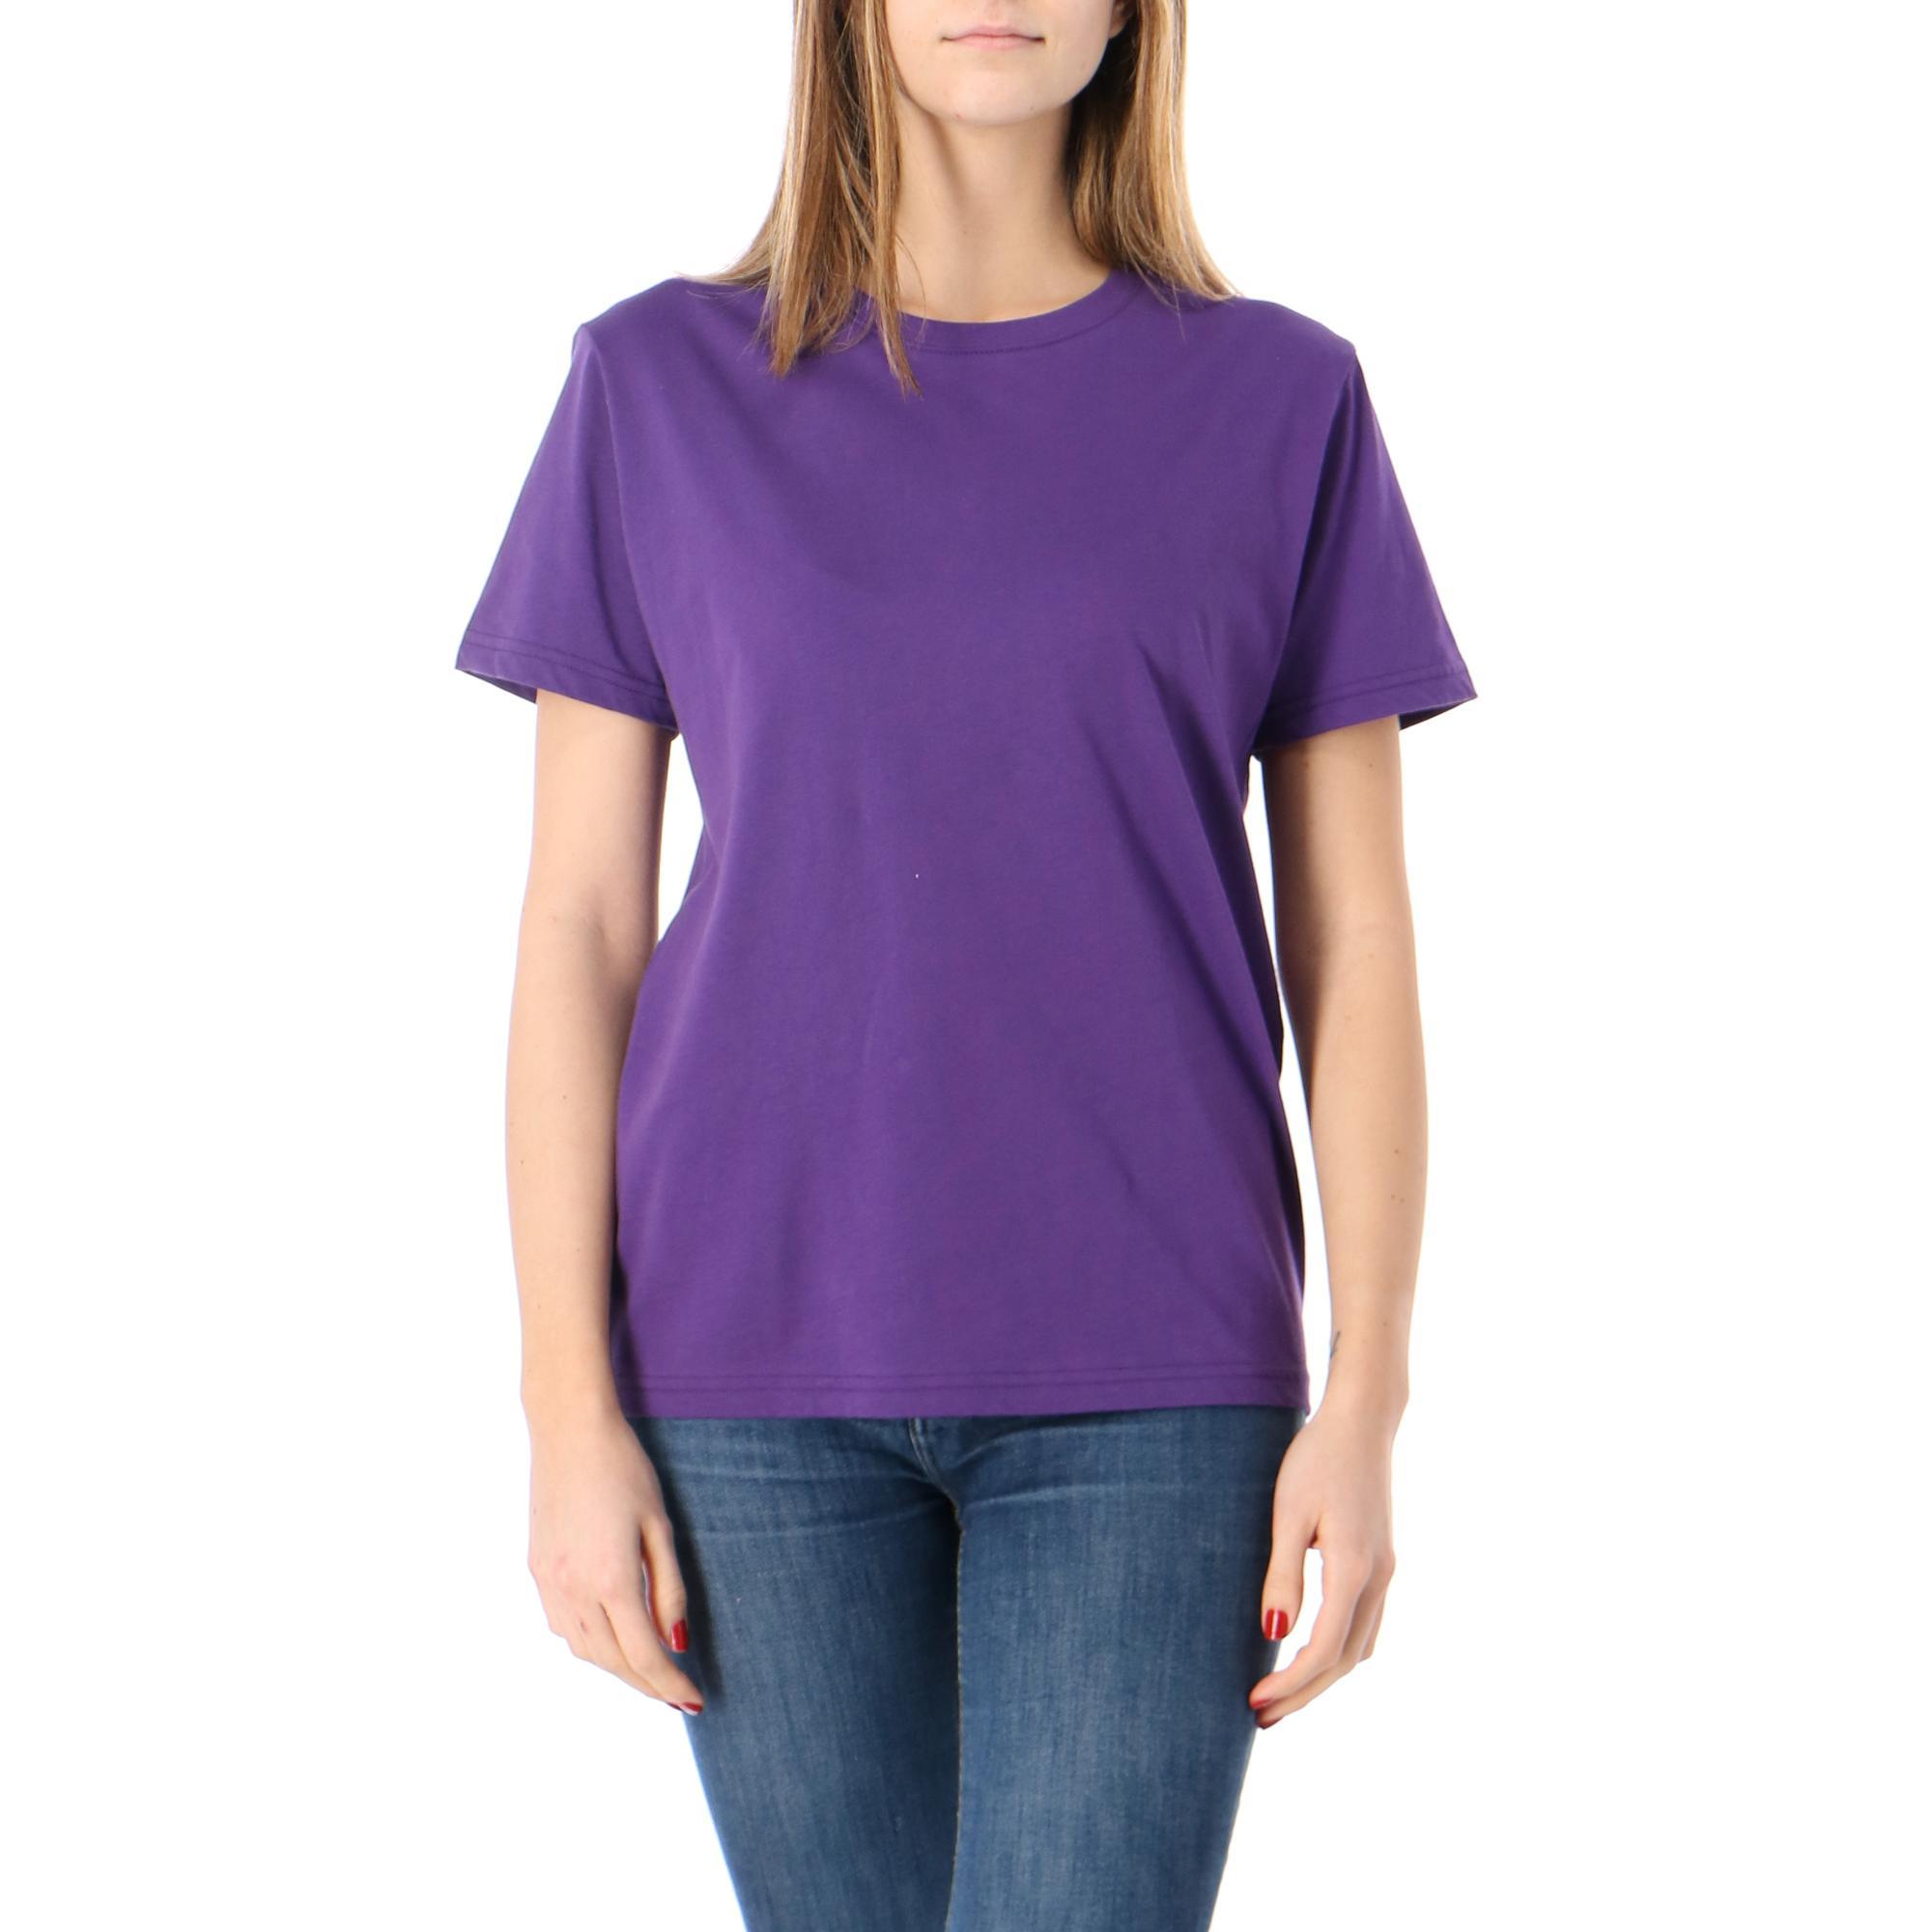 Treesse Classic Ss Tee Light purple